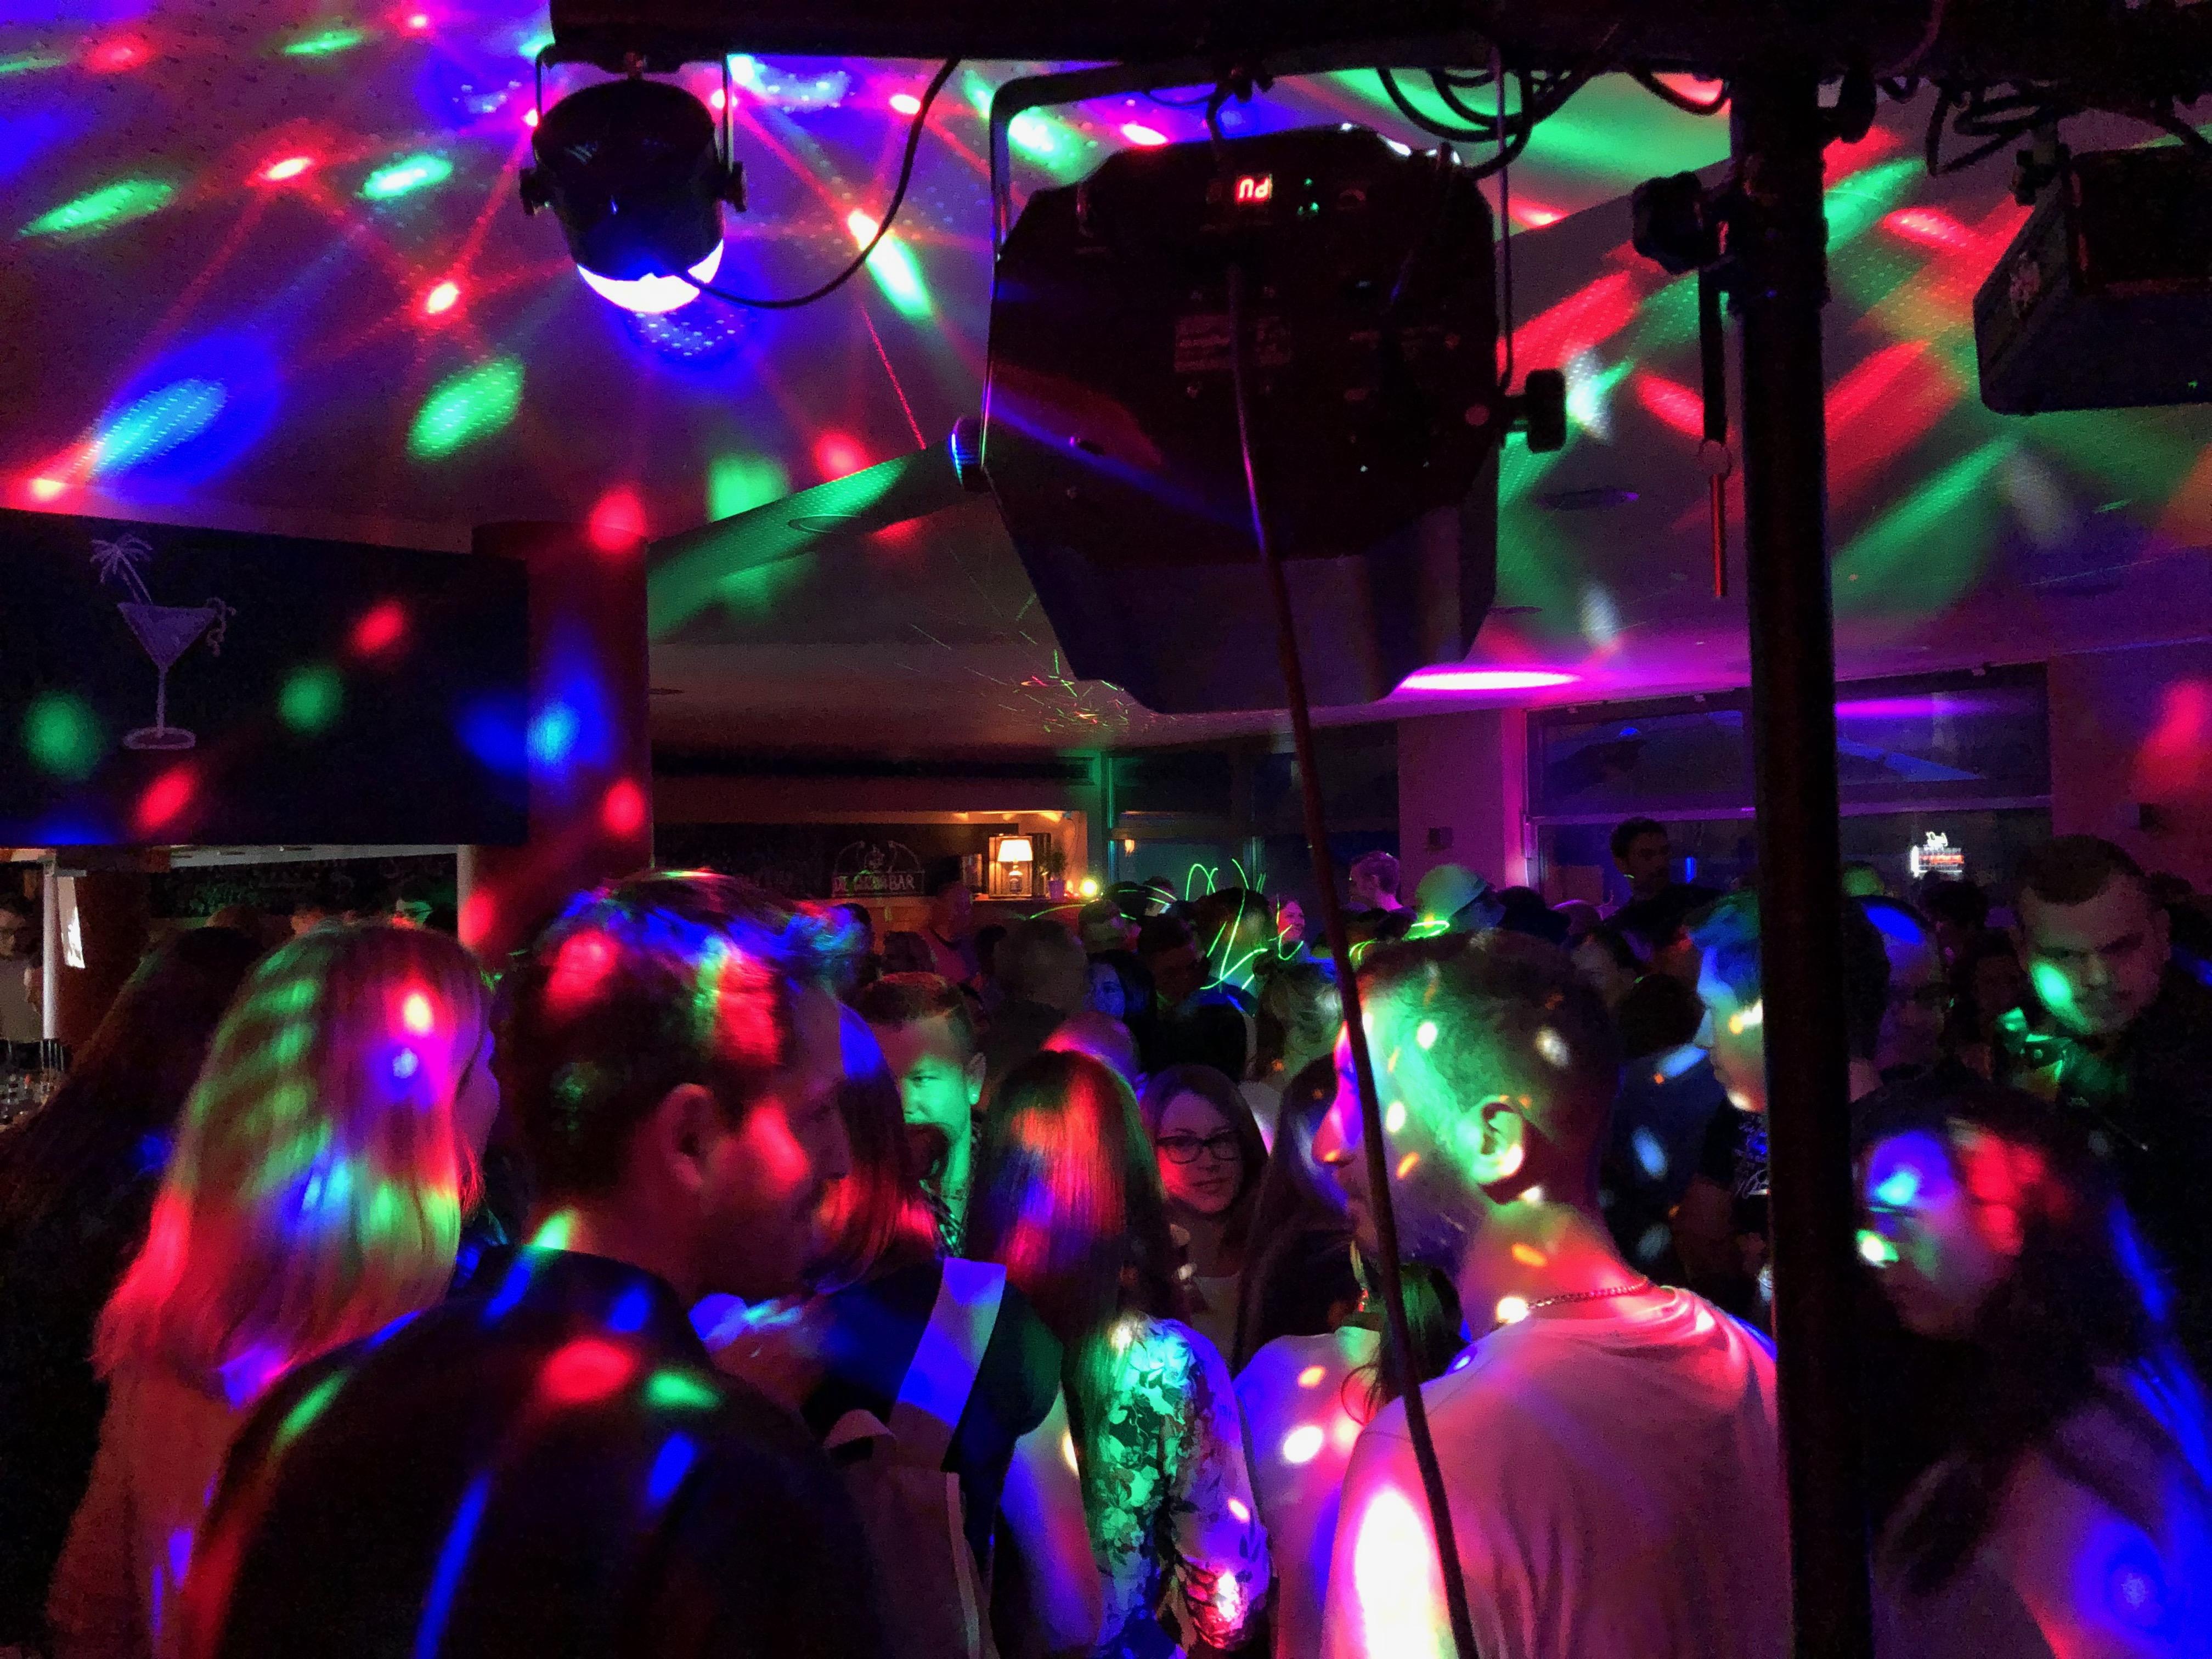 Lichttechnik - Stimmung - Tanz - Party | DJ TONY P